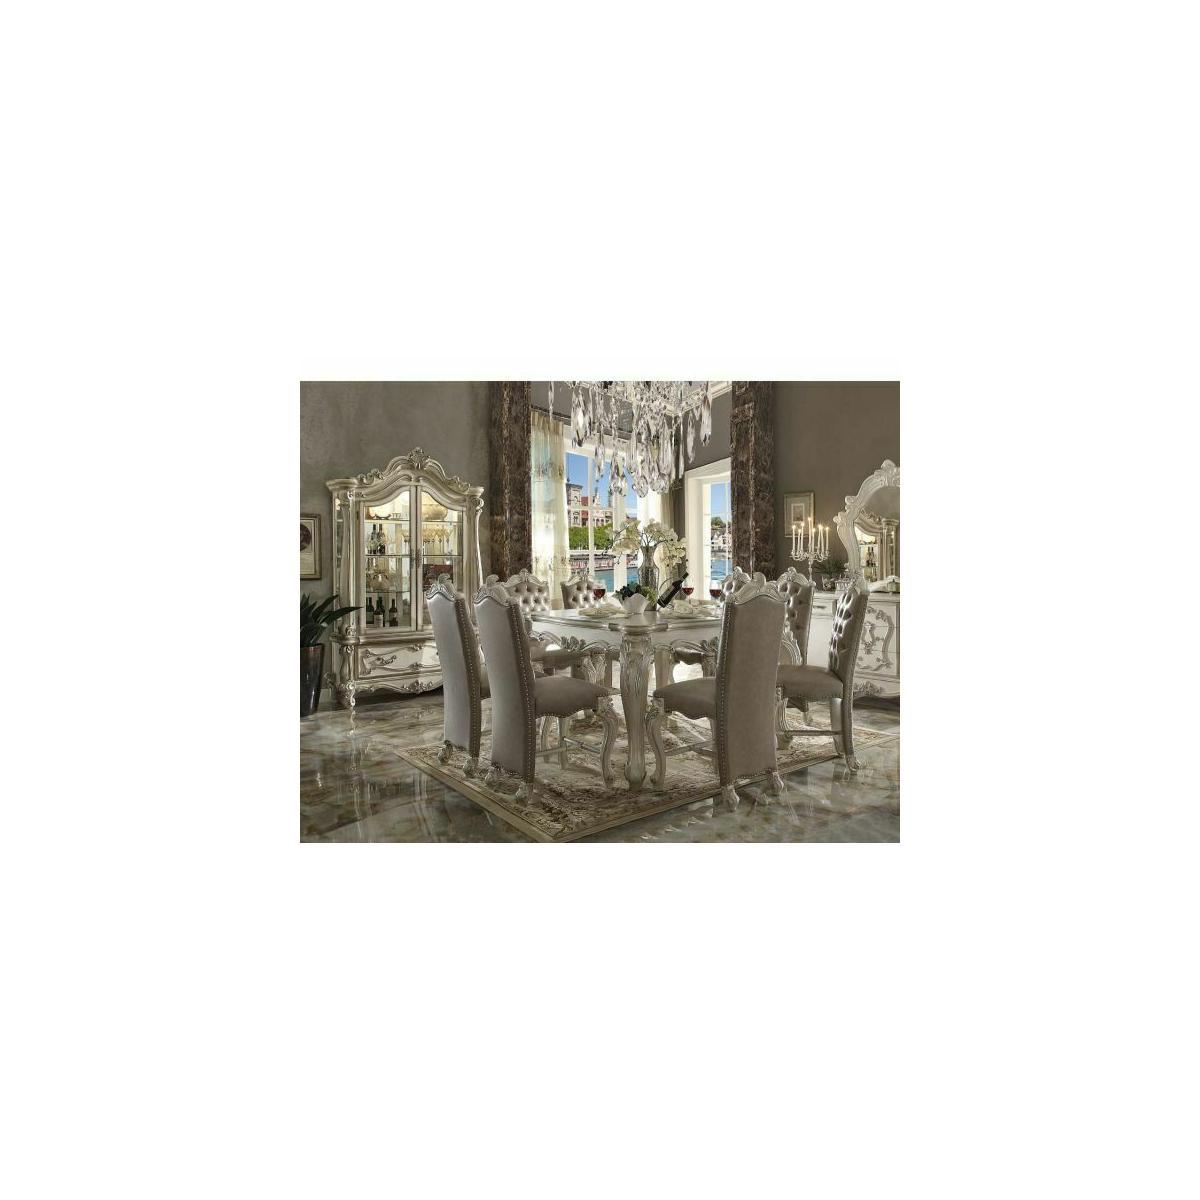 ACME Versailles Counter Height Table - 61150 - Bone White